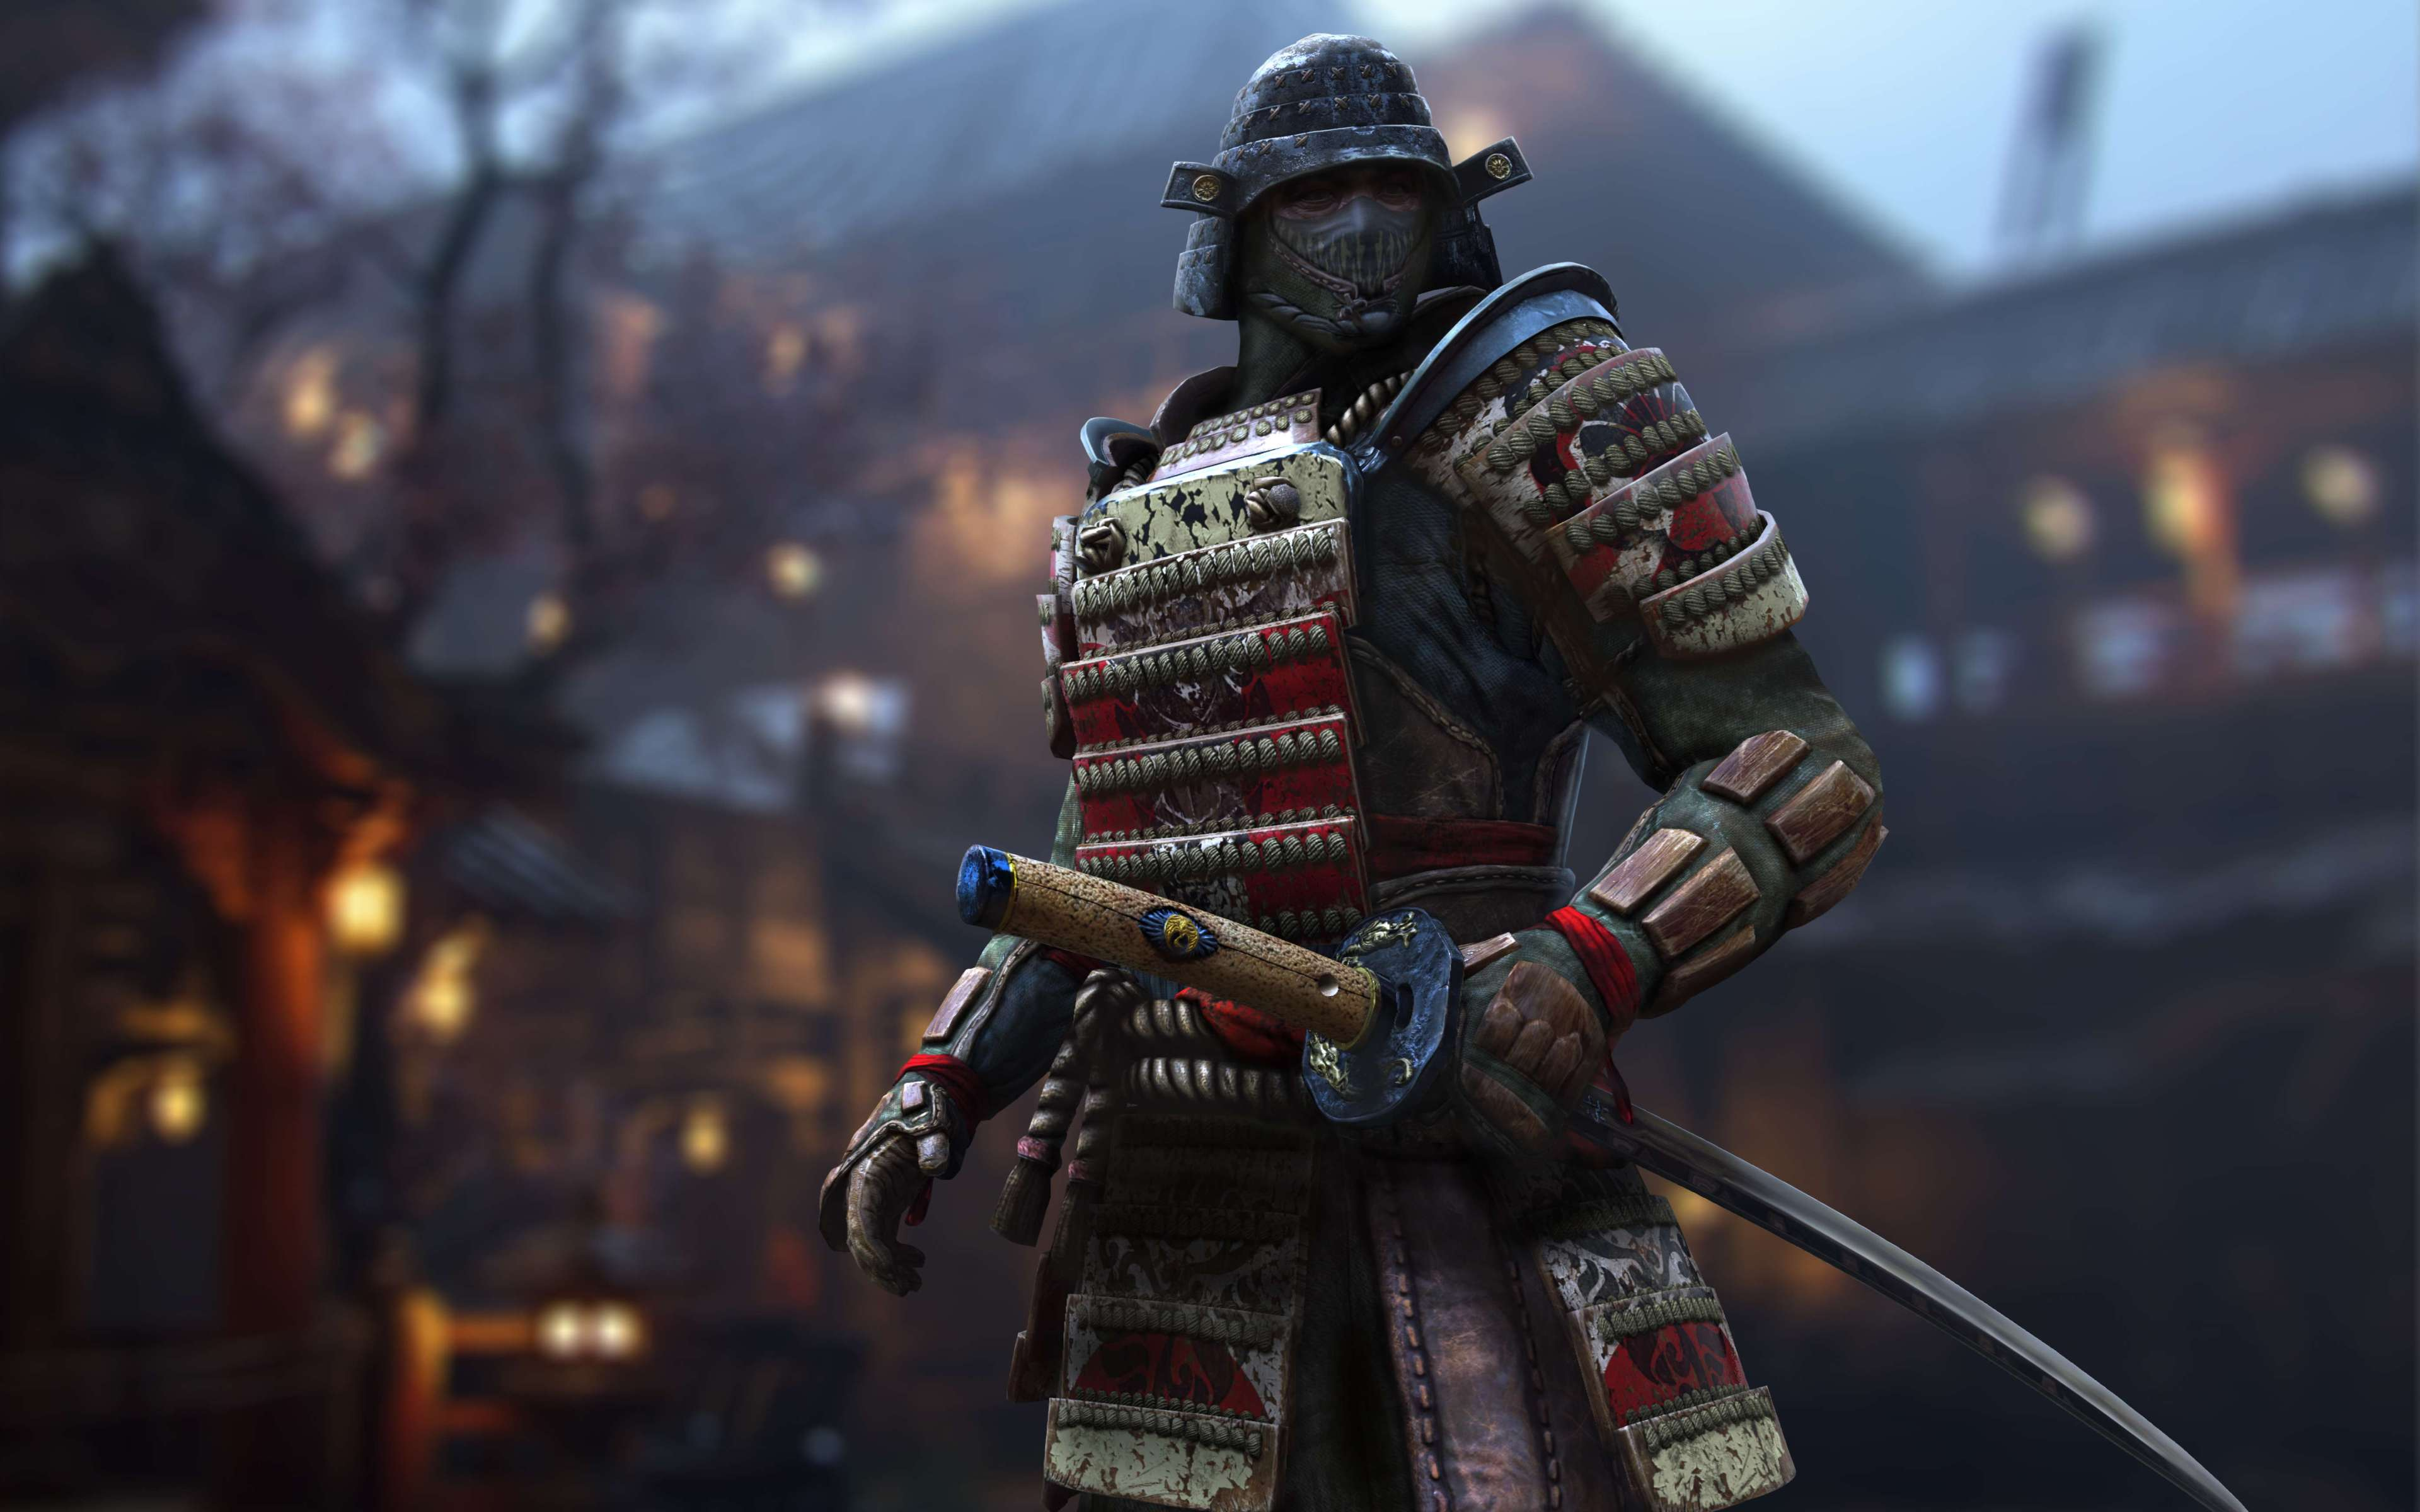 Wallpaper Viking Samurai For Honor Honor Orochi 1706159 Hd Wallpaper Backgrounds Download